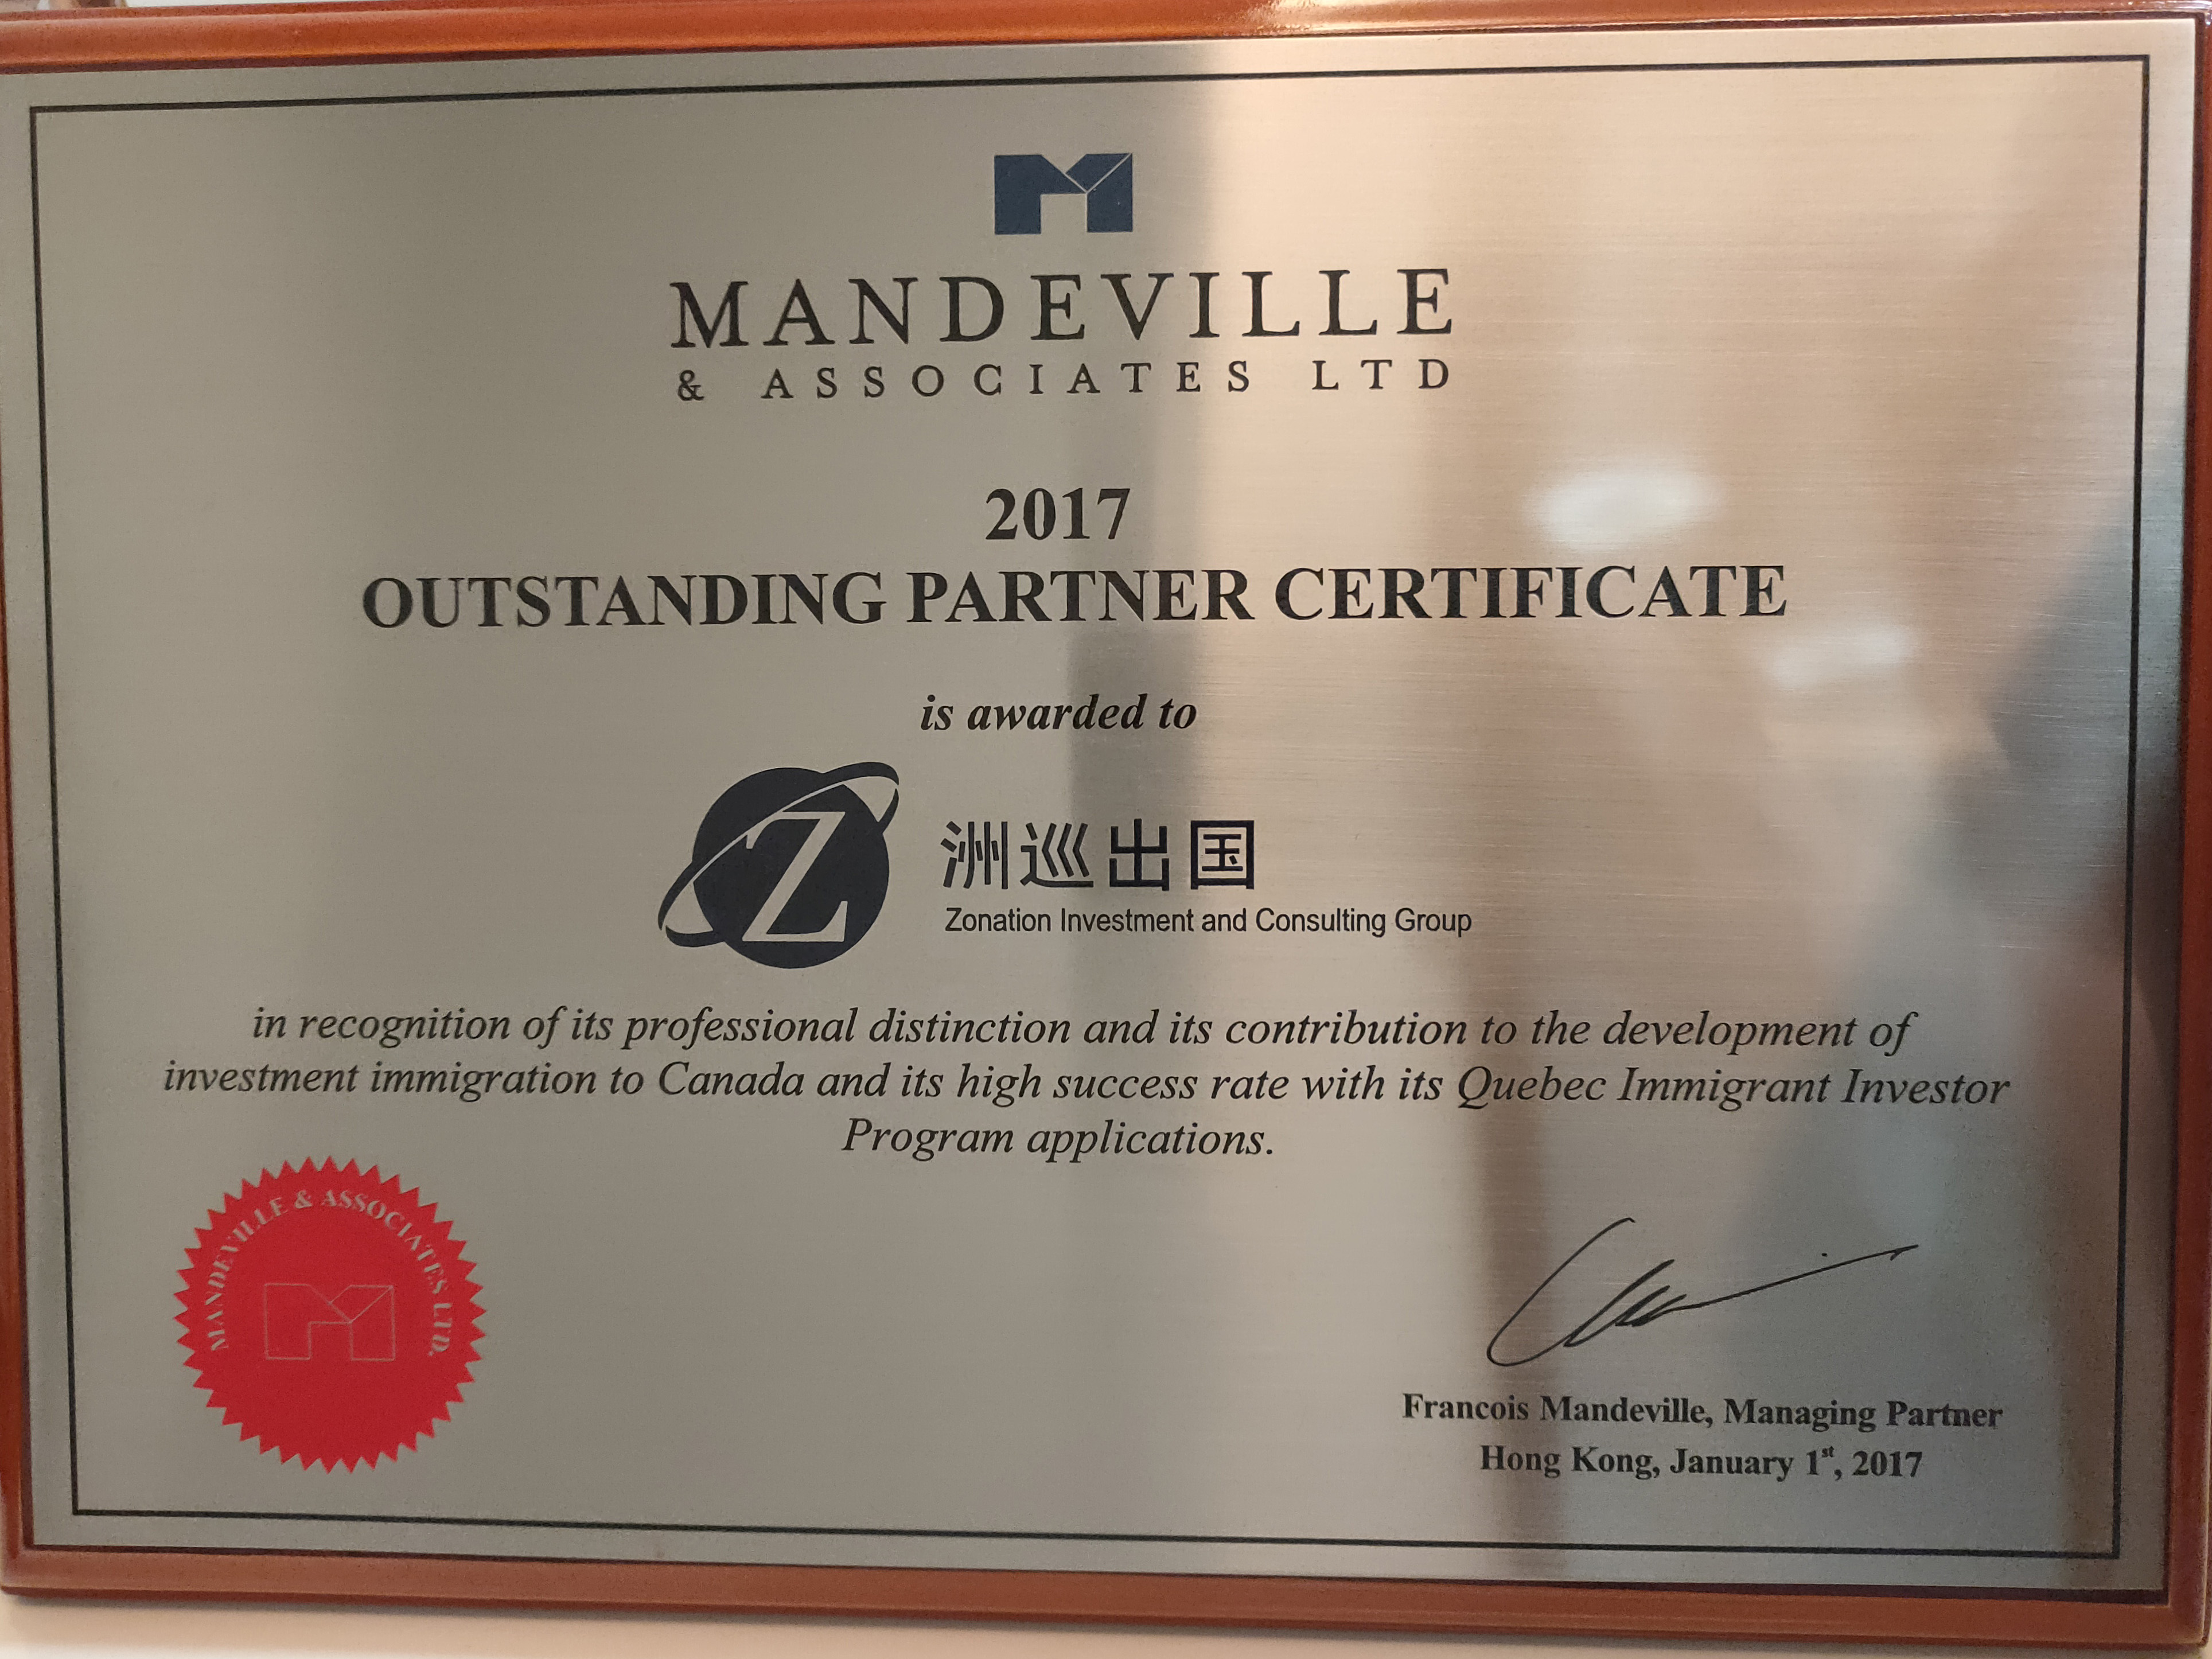 Mandeville优秀合伙人